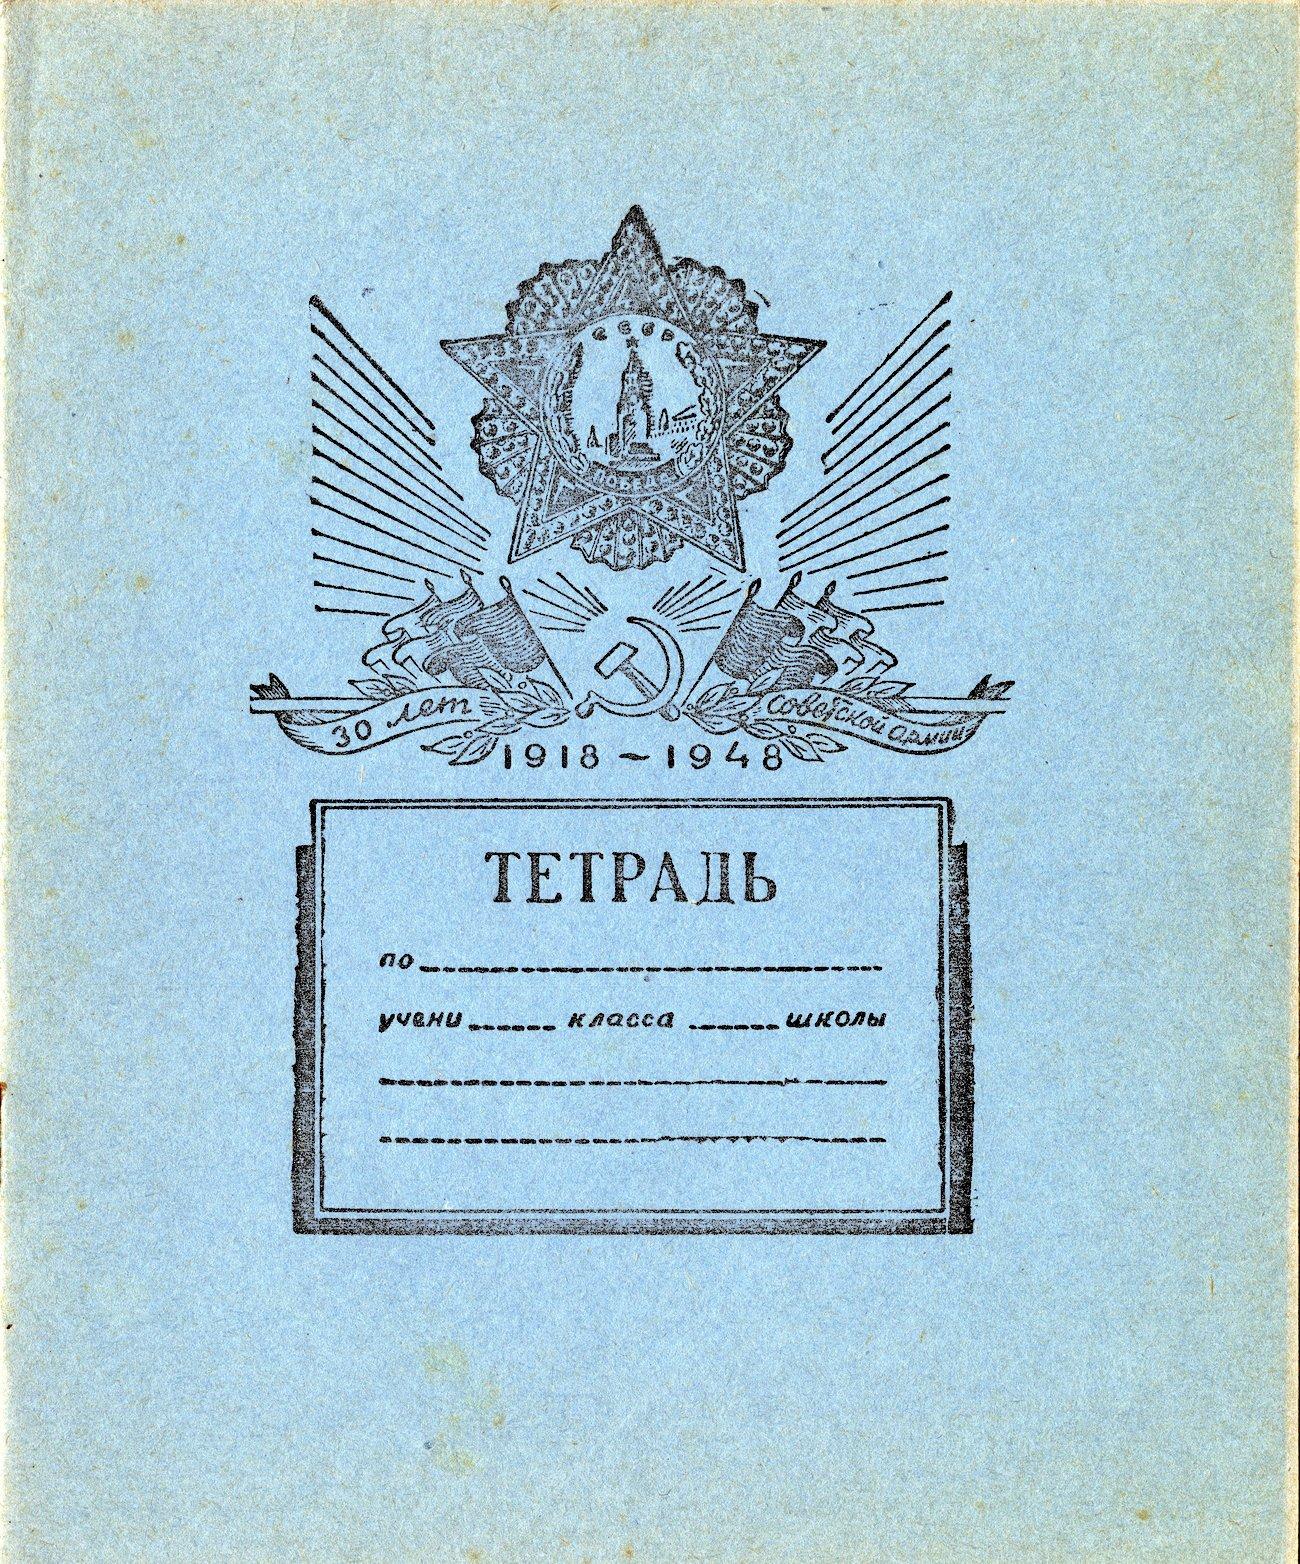 30 лет Советской армии, 1948, 170х205